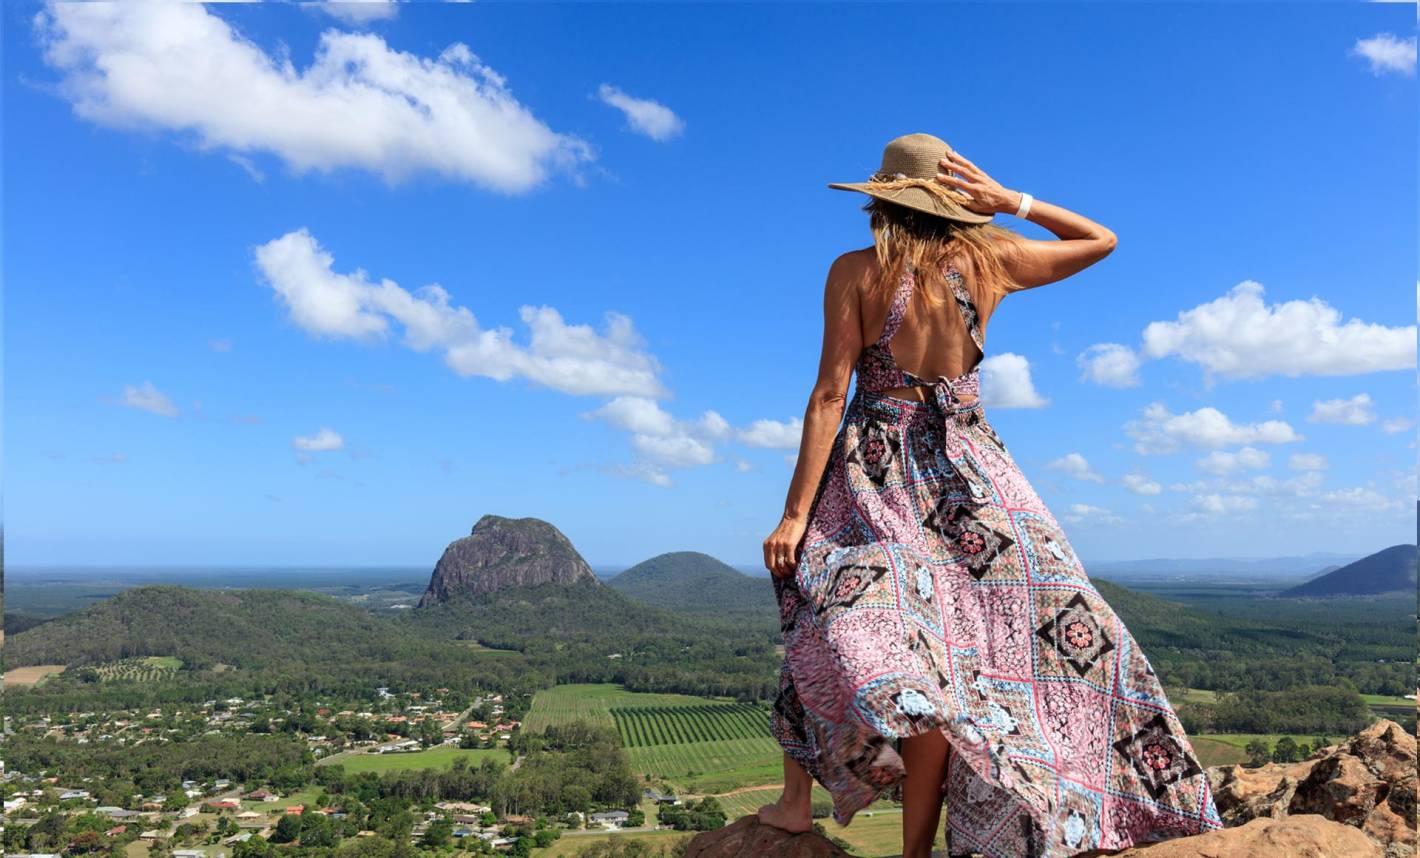 50 reasons to visit the Sunshine Coast